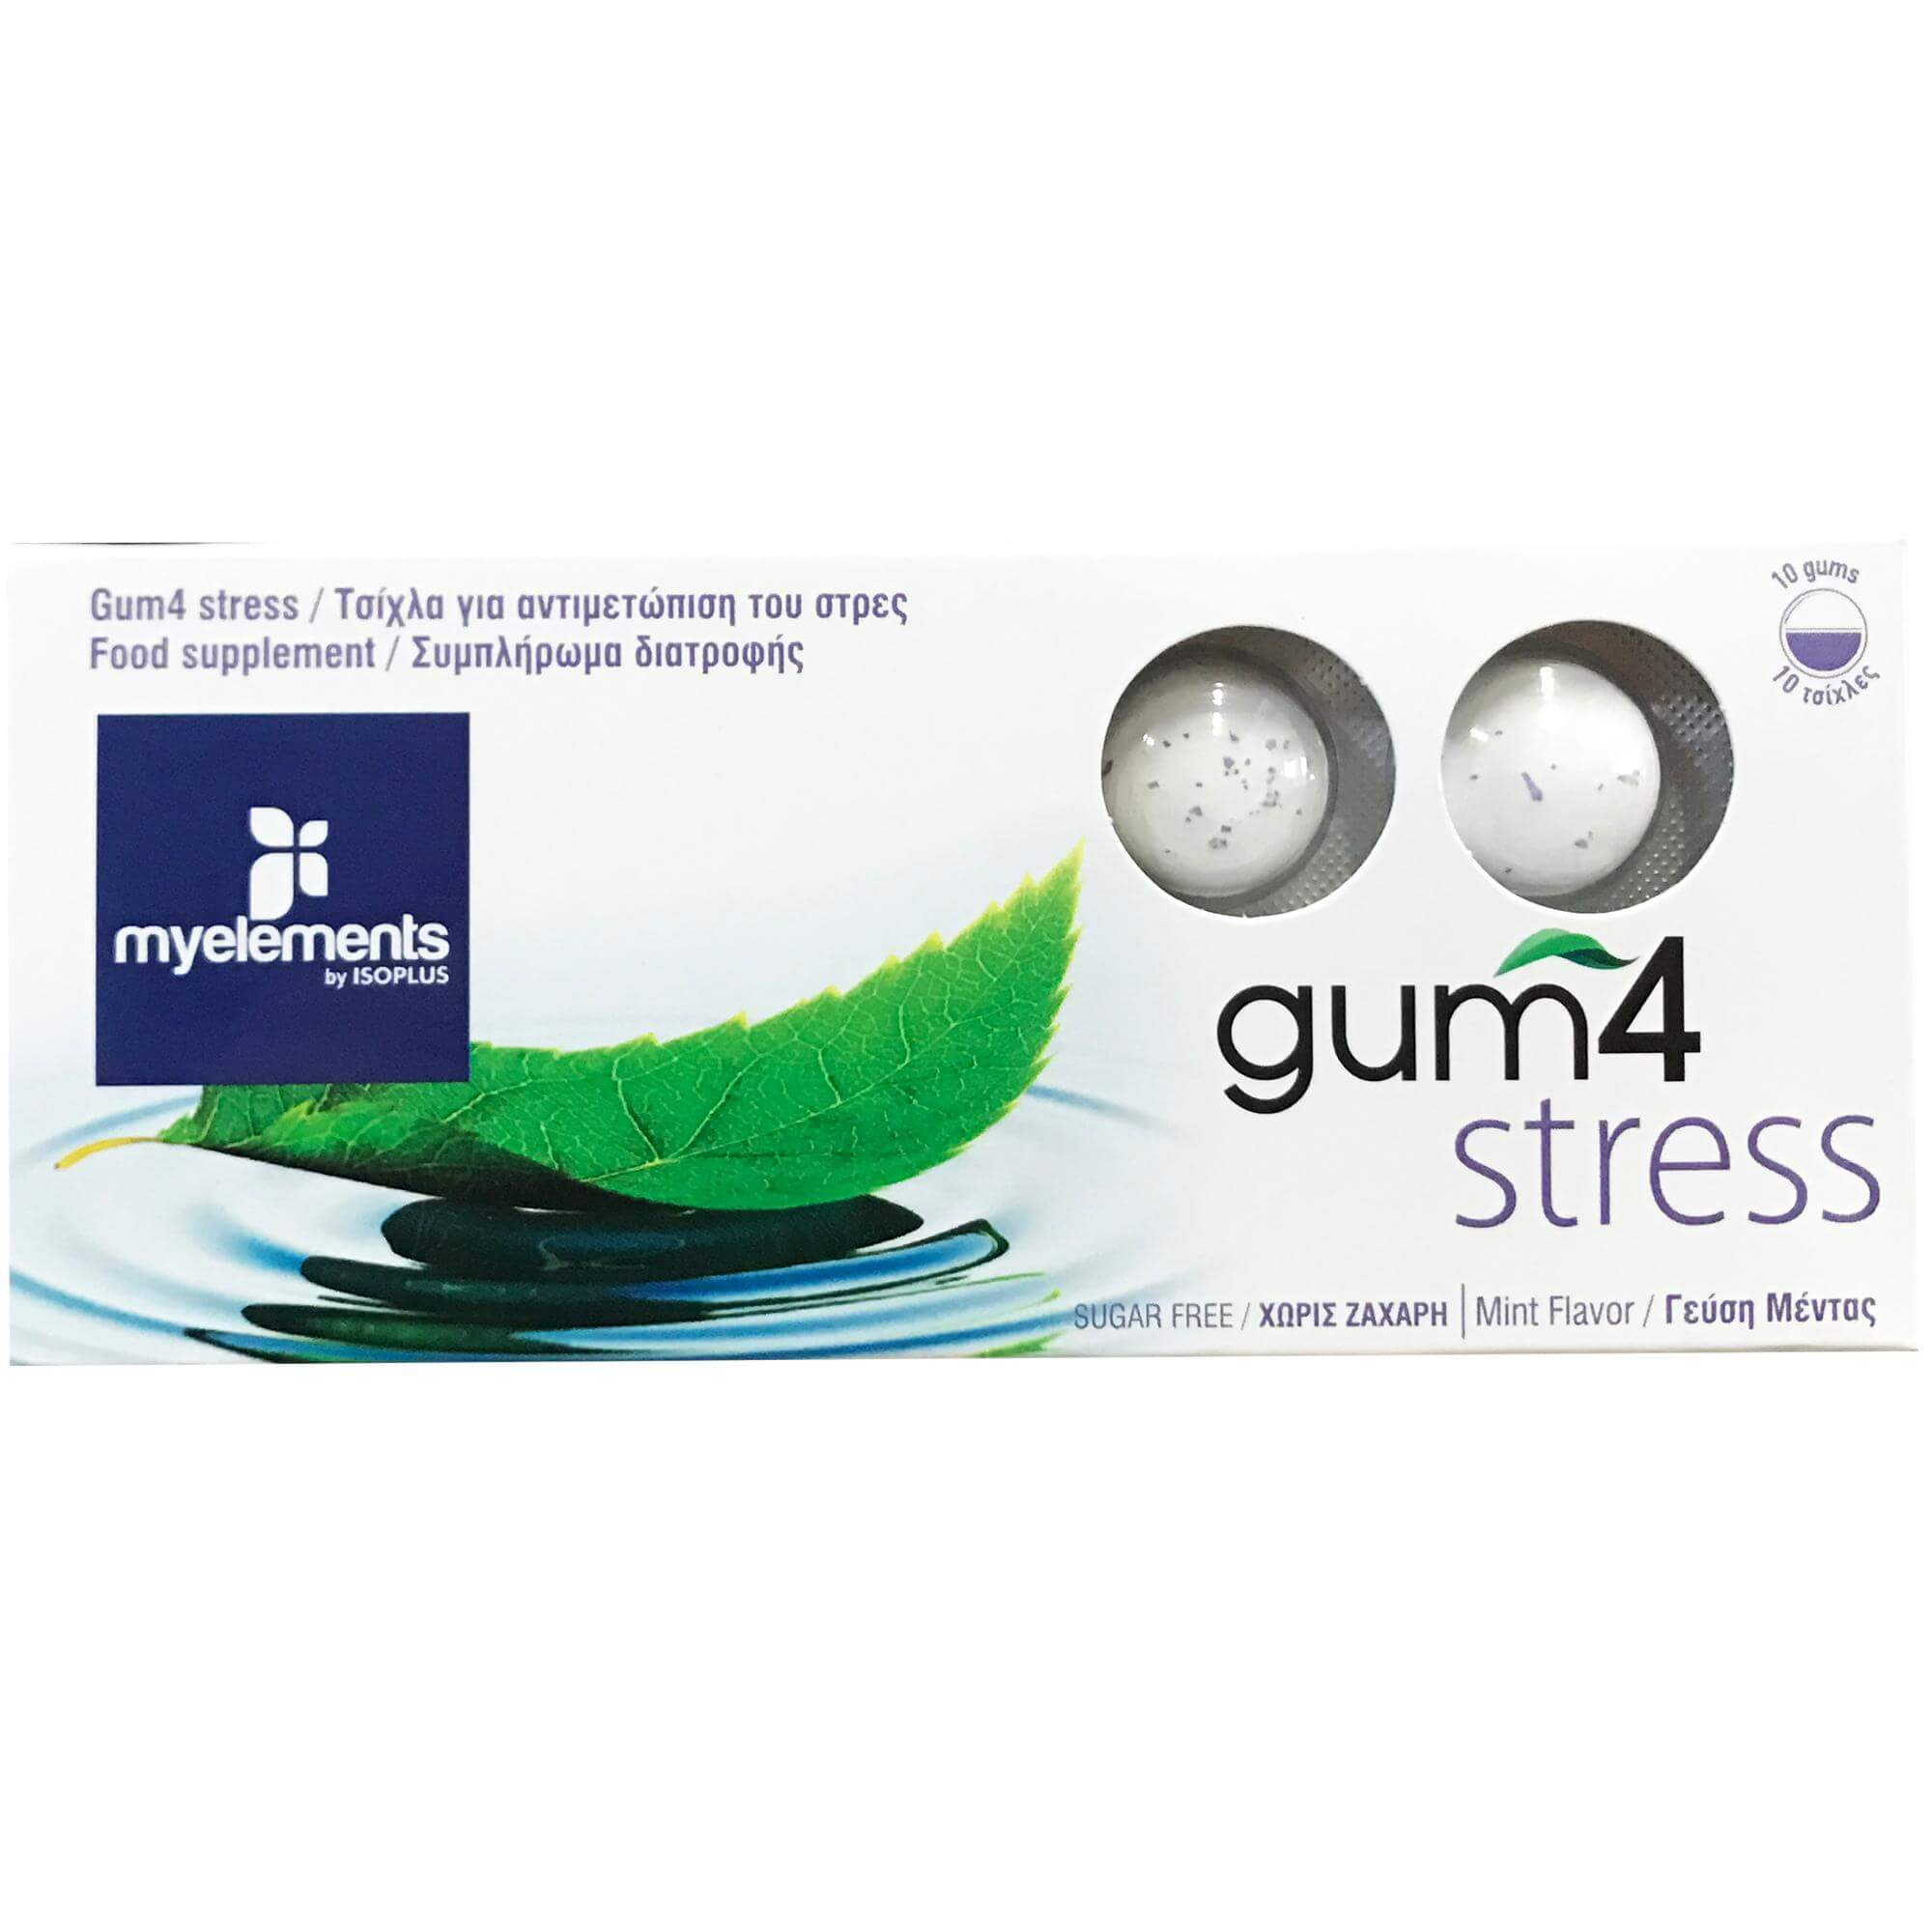 My Elements Gum 4Συμπλήρωμα Διατροφής σε Μορφή Τσίχλας10 Τεμάχια – Stress